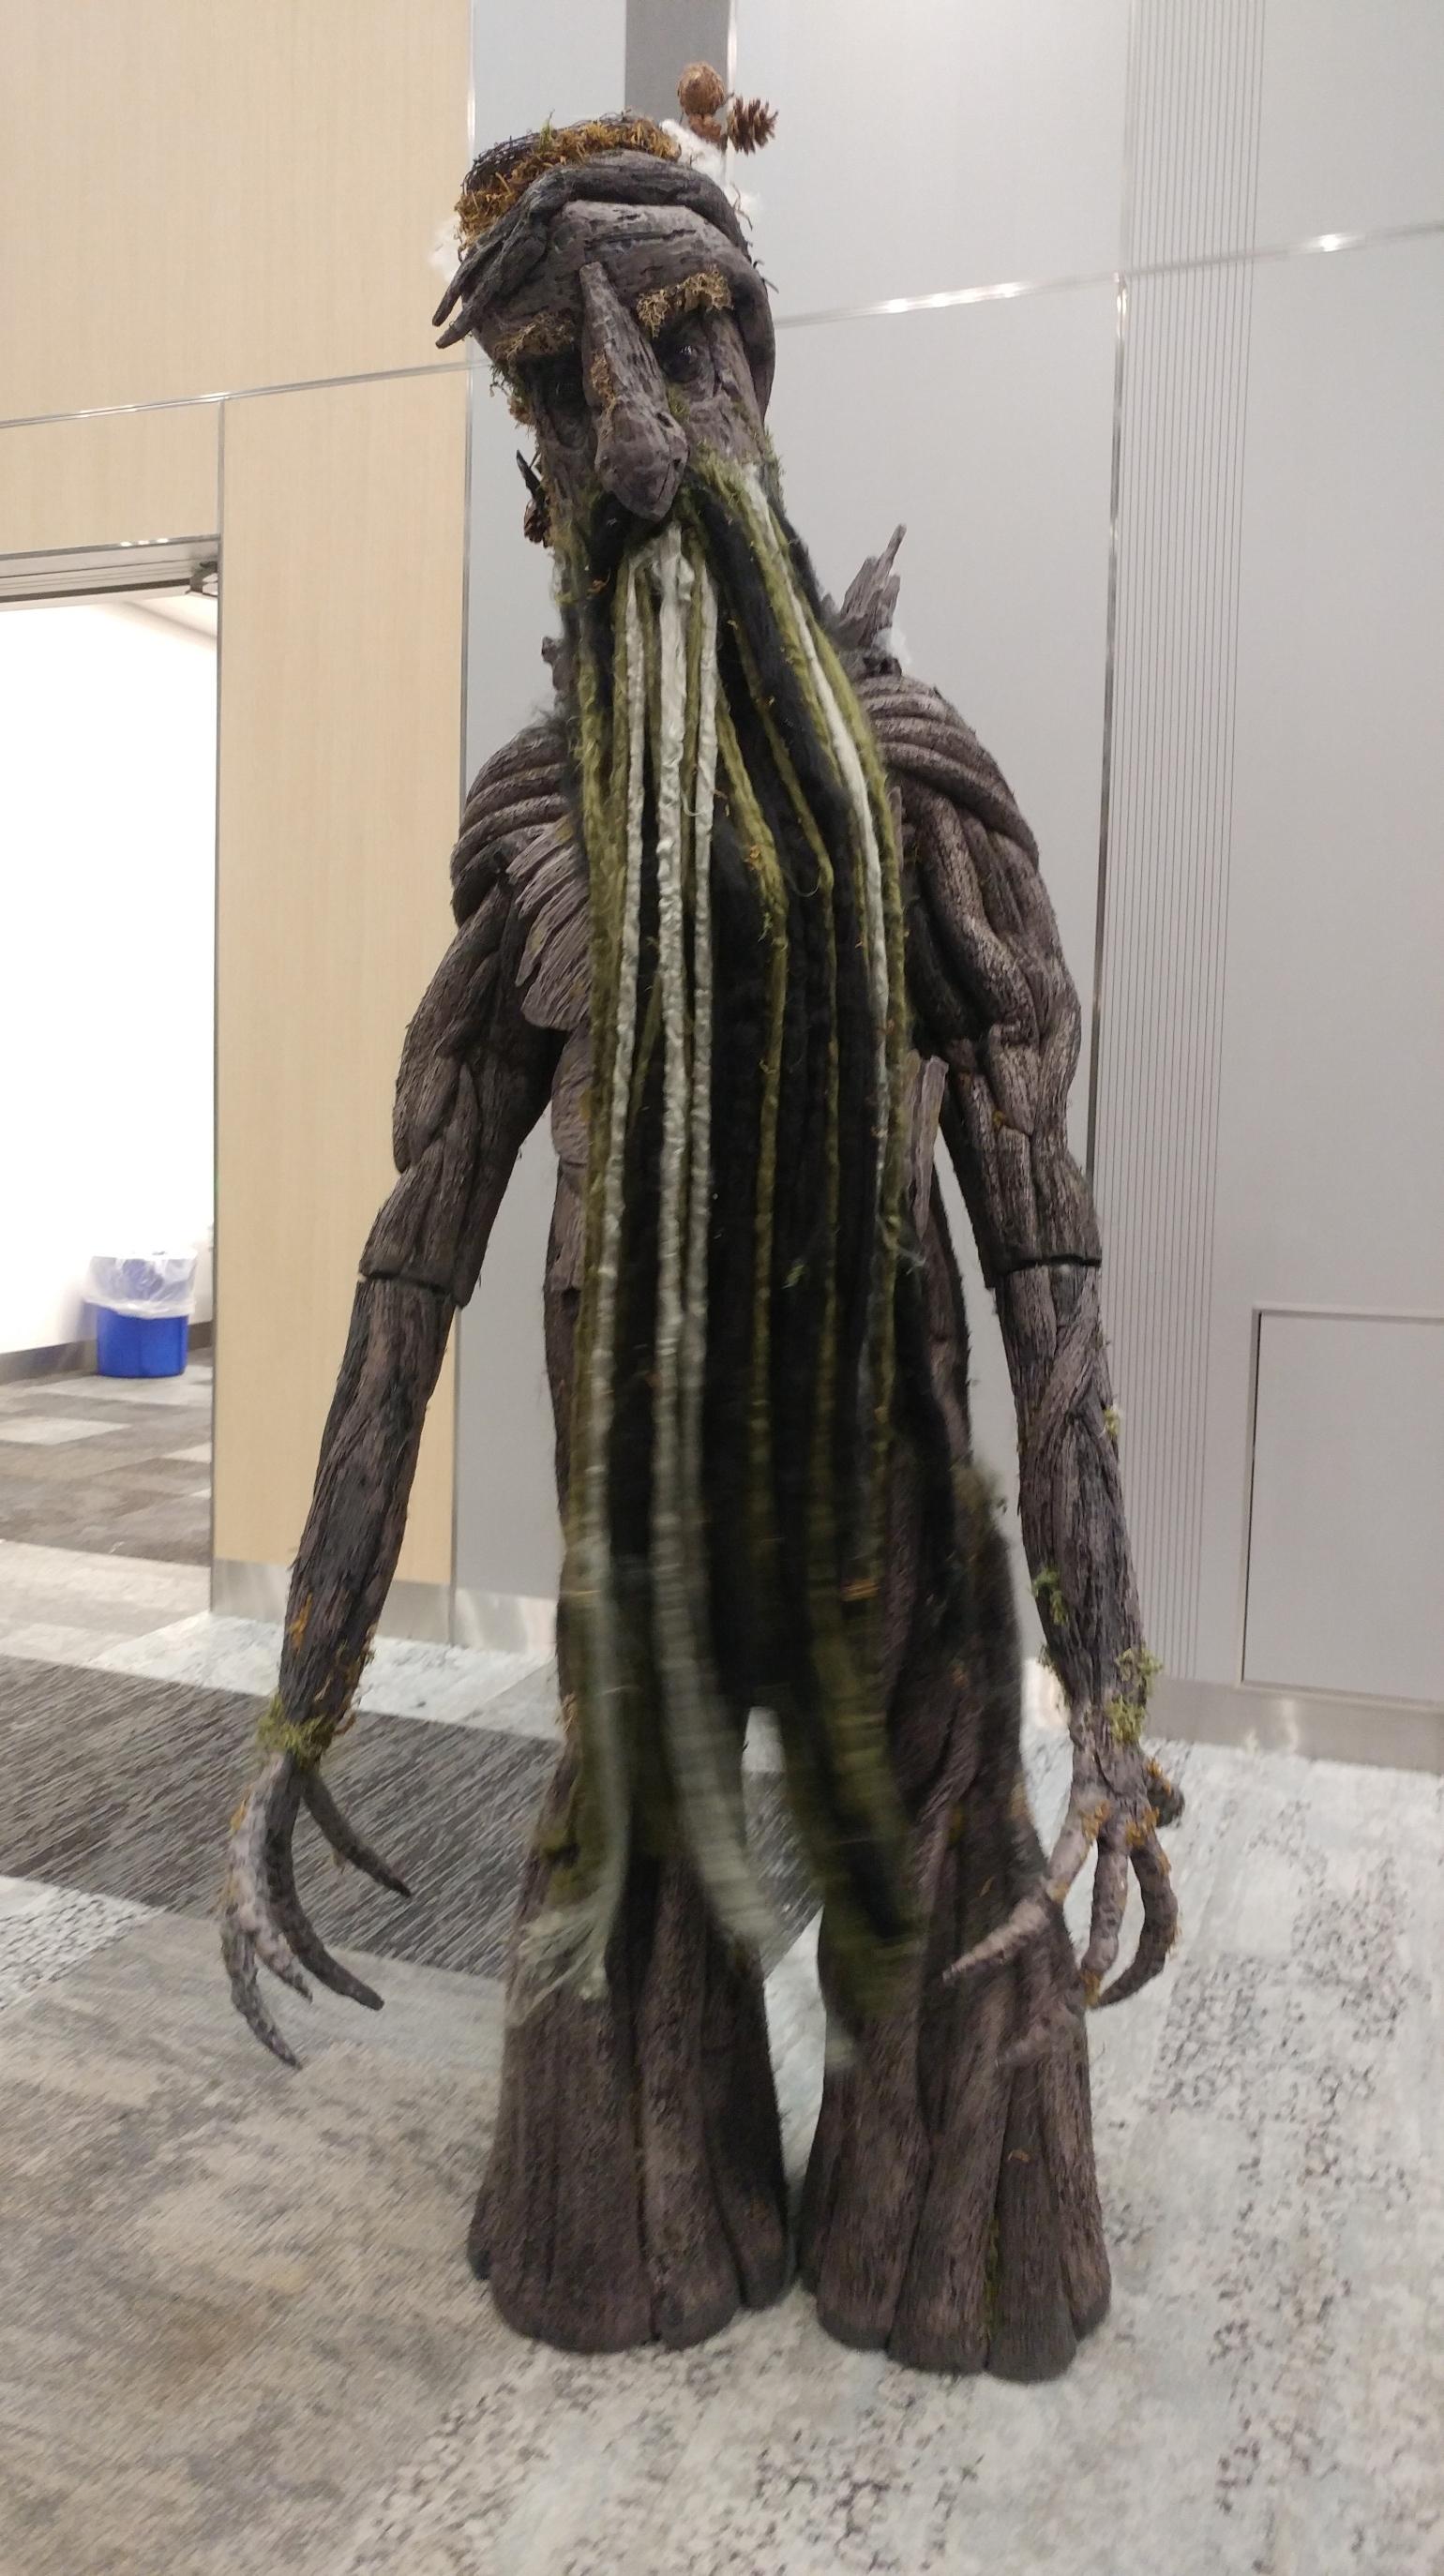 06_Ent_Treebeard